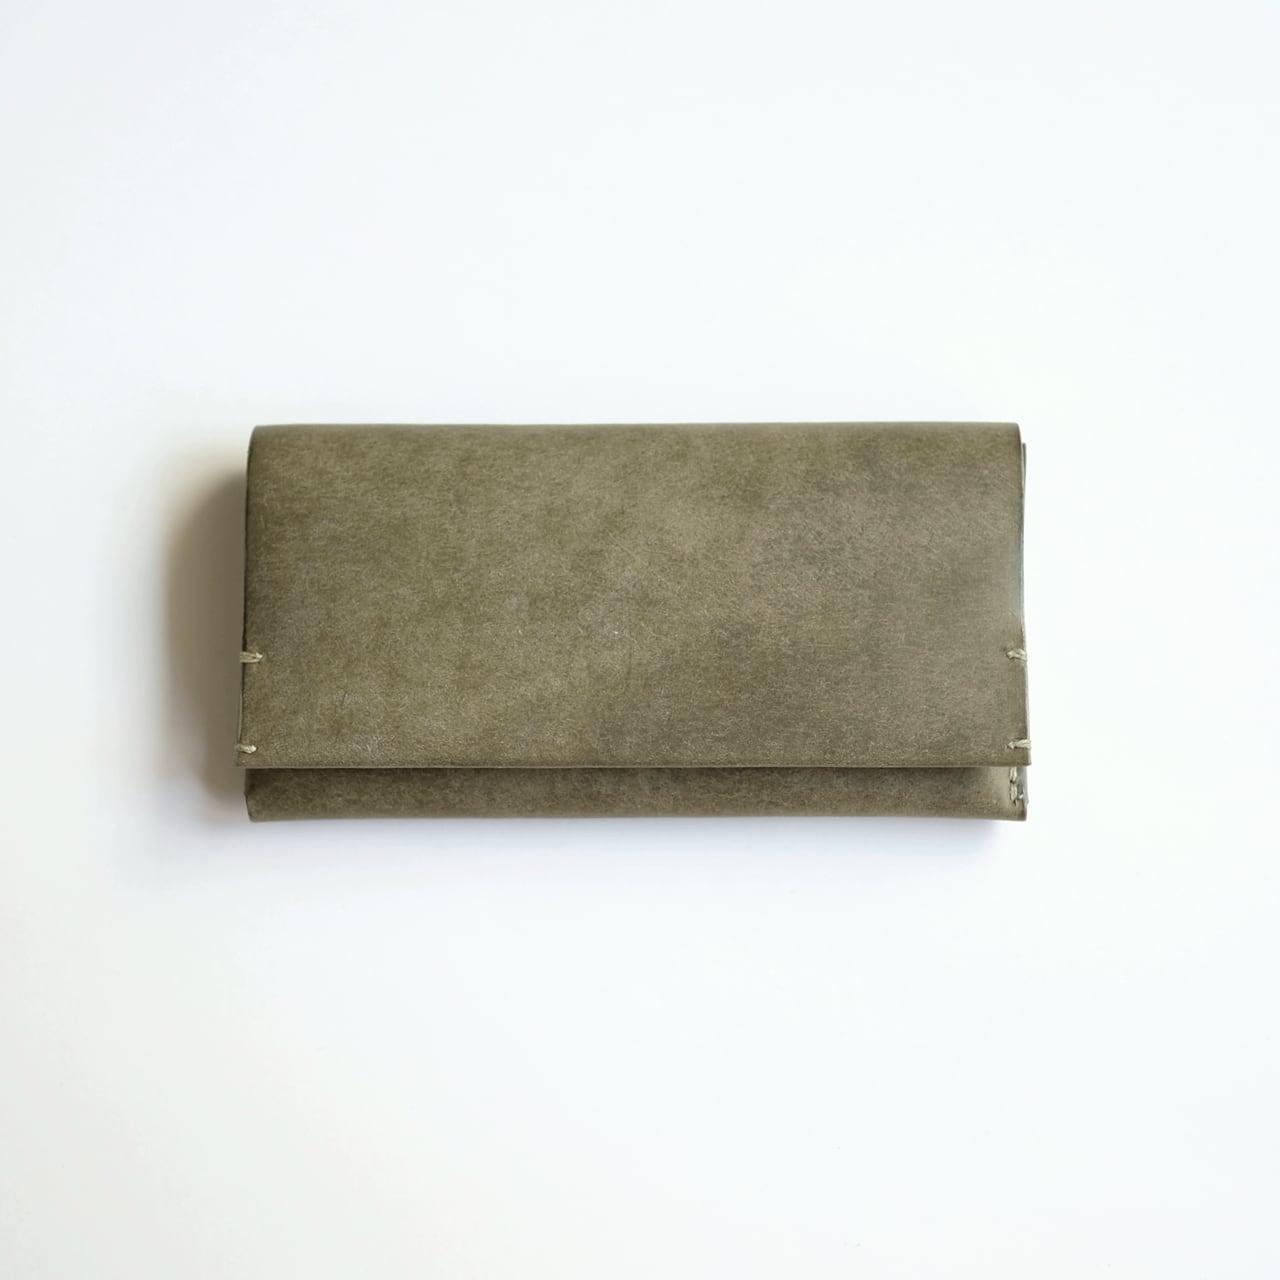 long wallet - gri - プエブロ